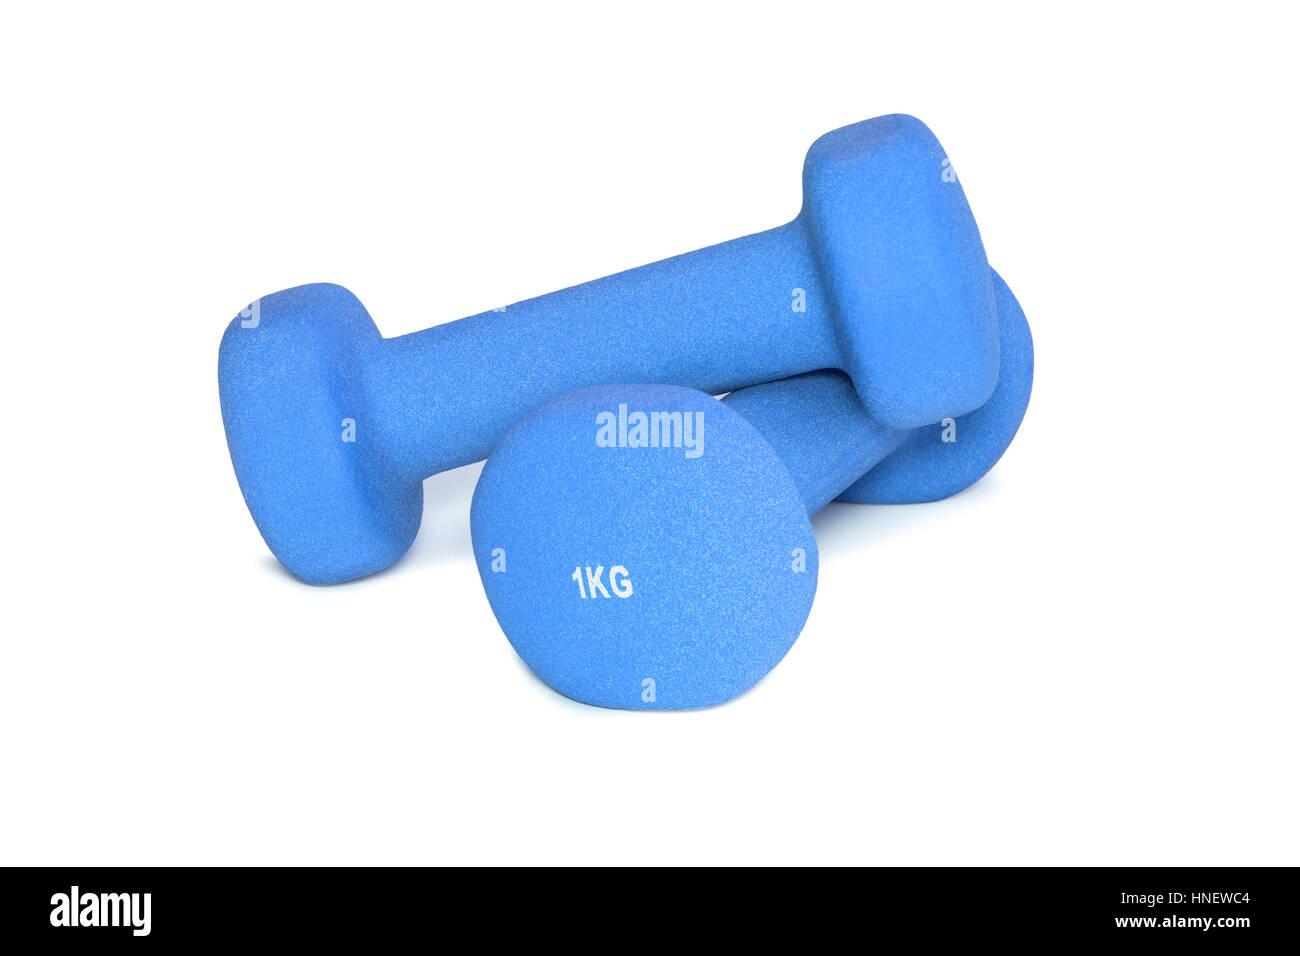 Blue dumbbells isolated on white background. Sports Equipment - Stock Image